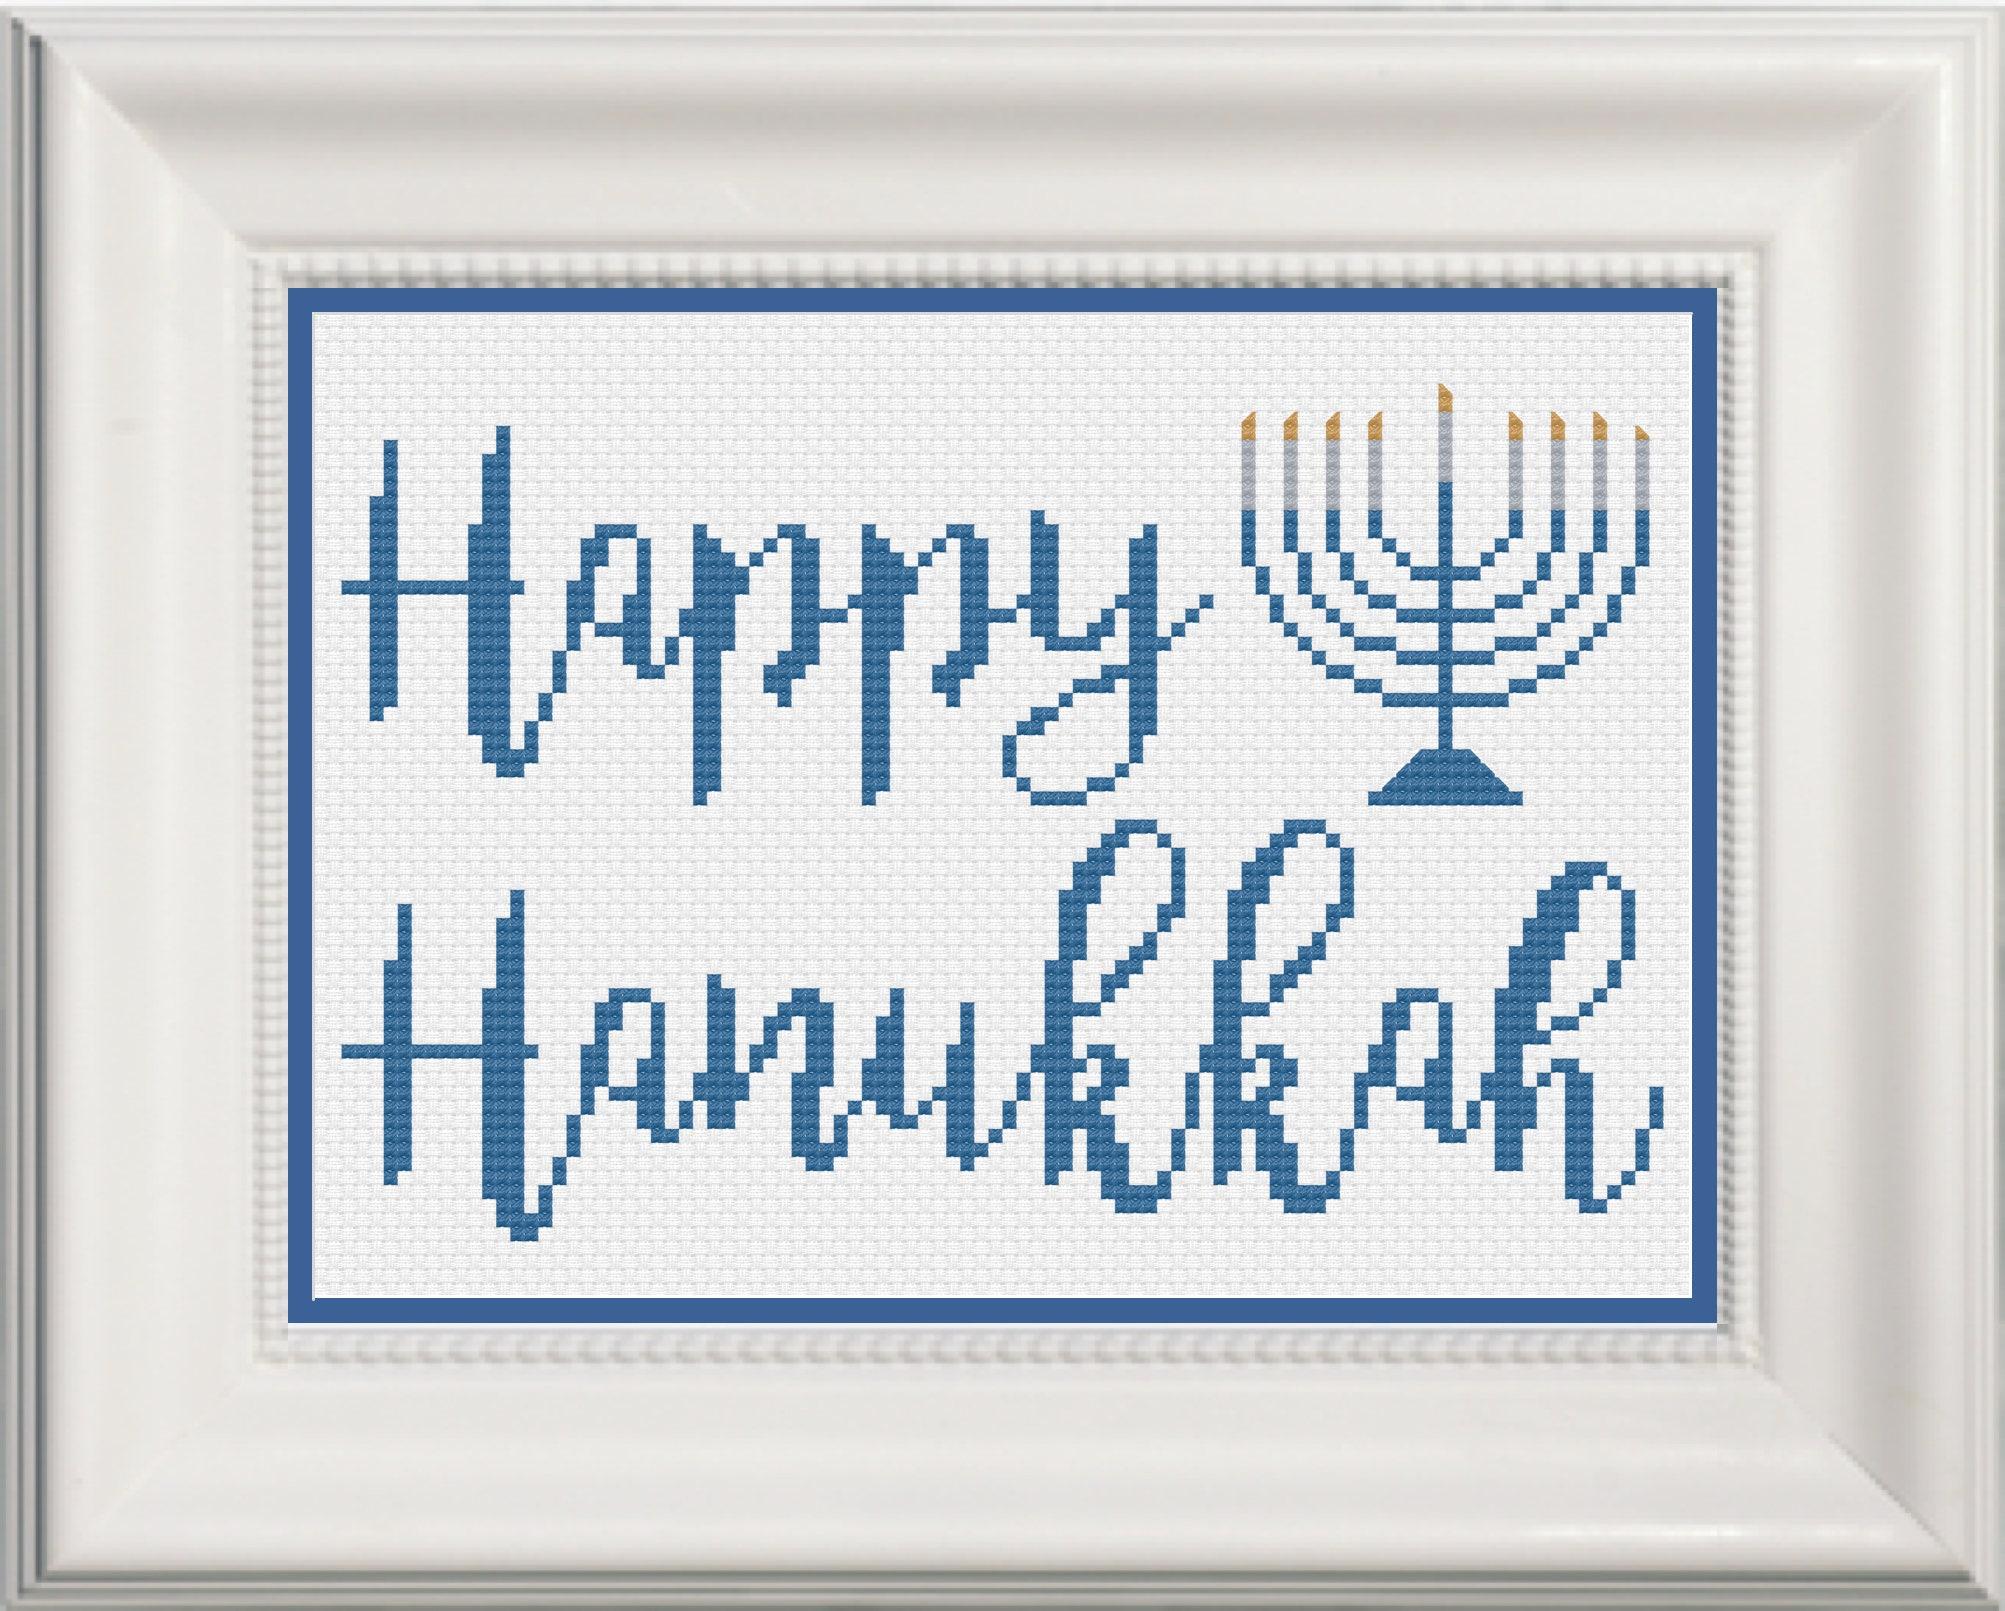 Happy Hanukkah With Menorah Cross Stitch Pattern Instant Etsy